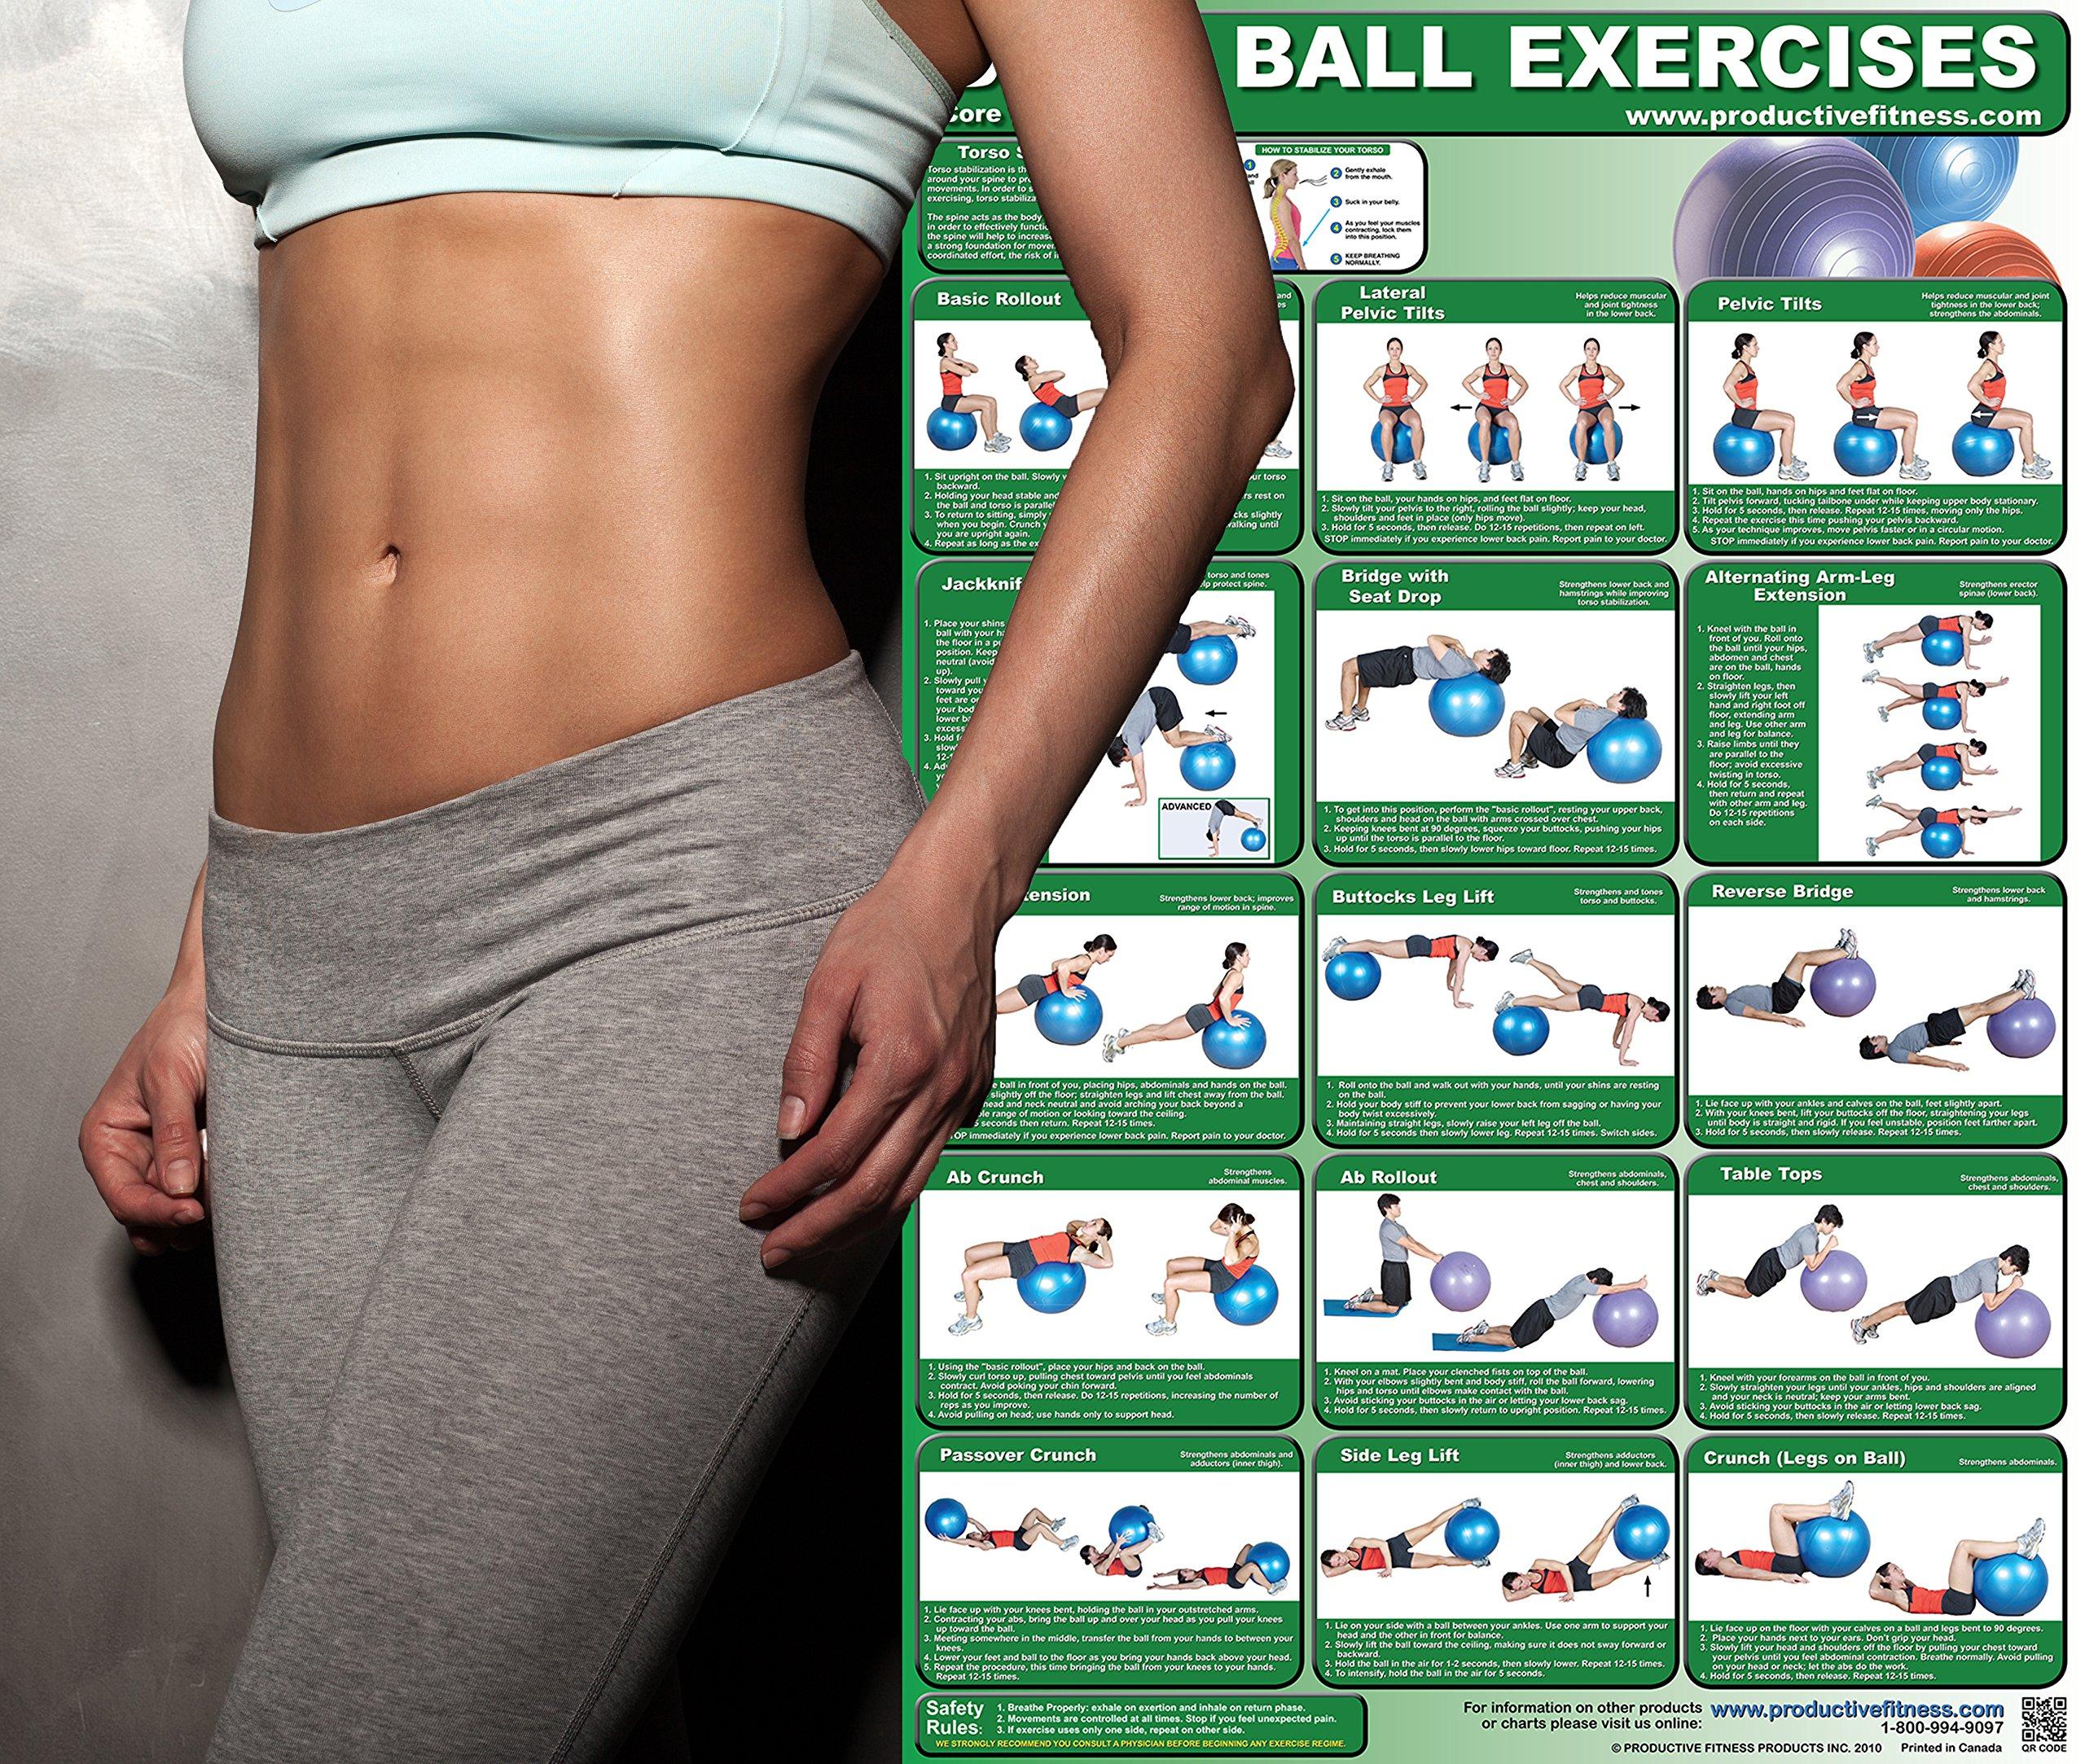 body ball exercises core laminated poster andre noel potvin 本